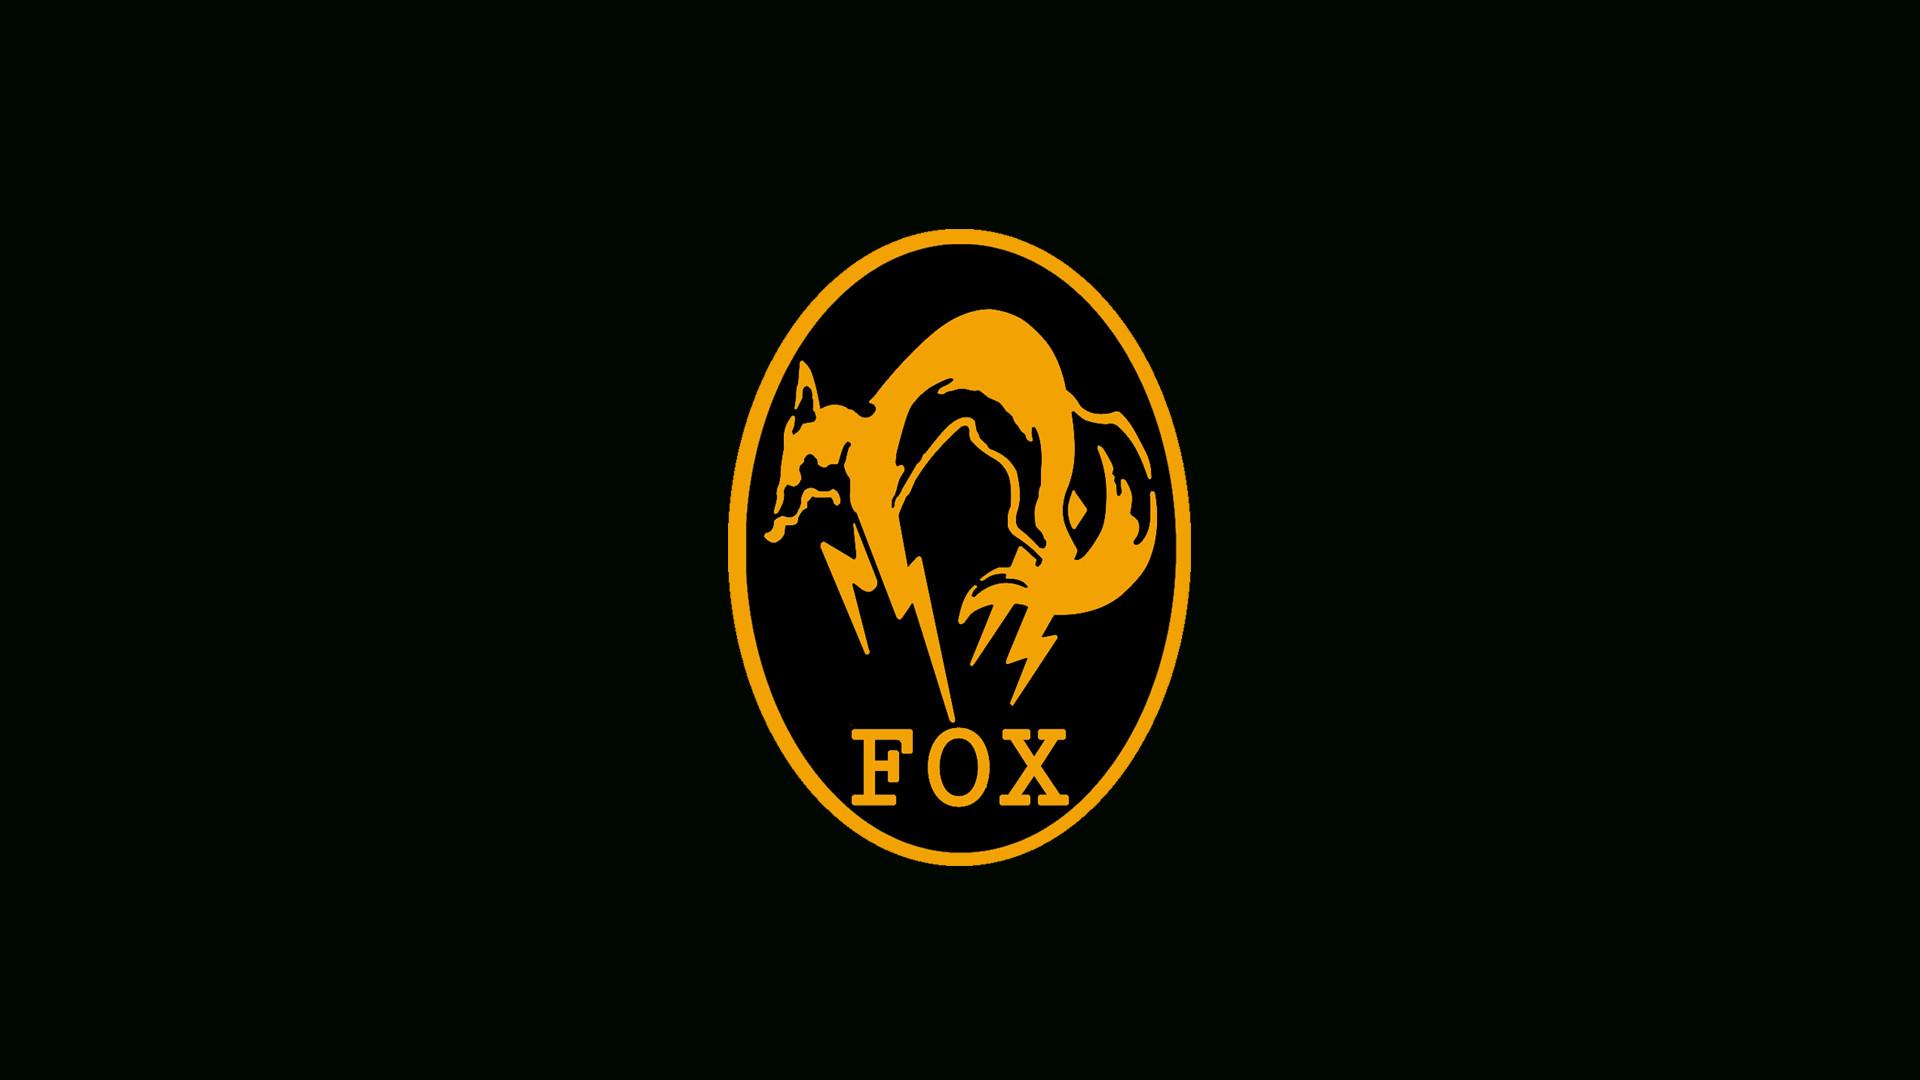 Metal Gear Solid FOX – Wallpaper